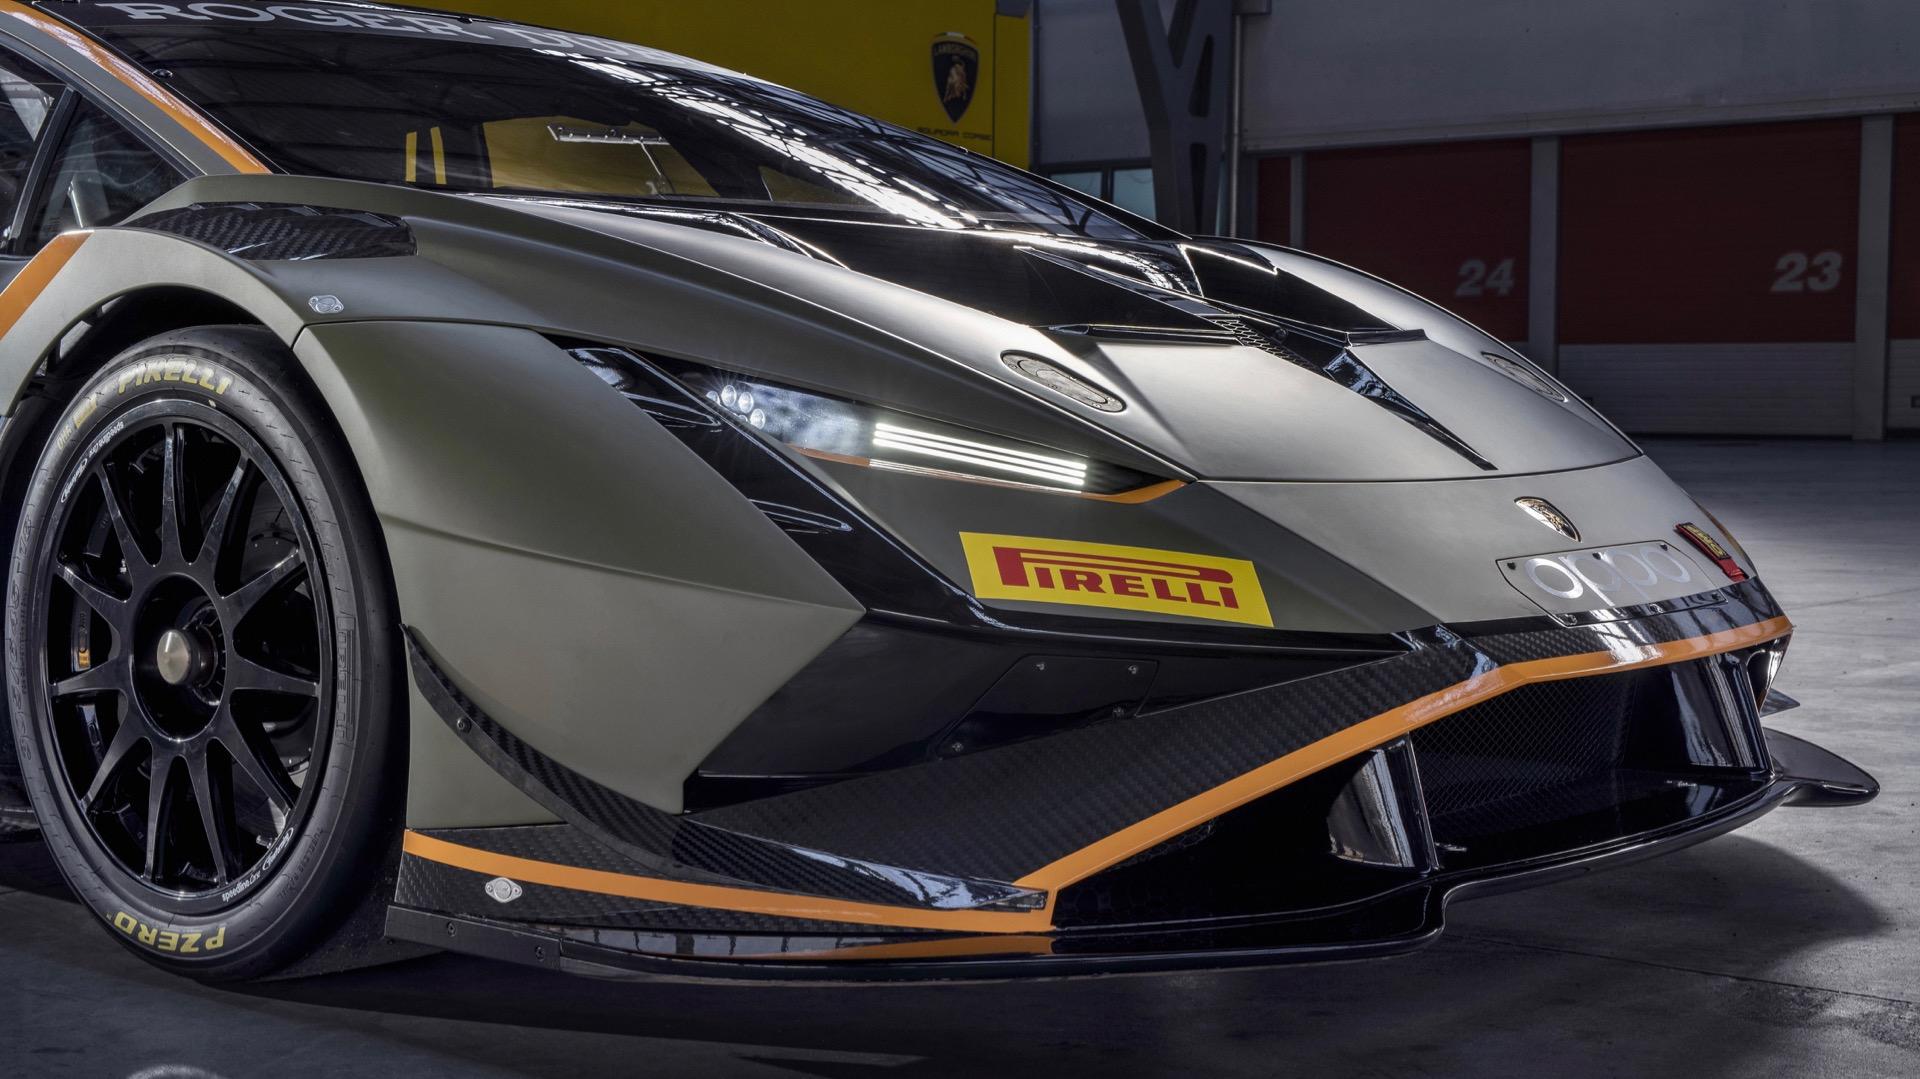 The Lamborghini Huracan Super Trofeo Evo2